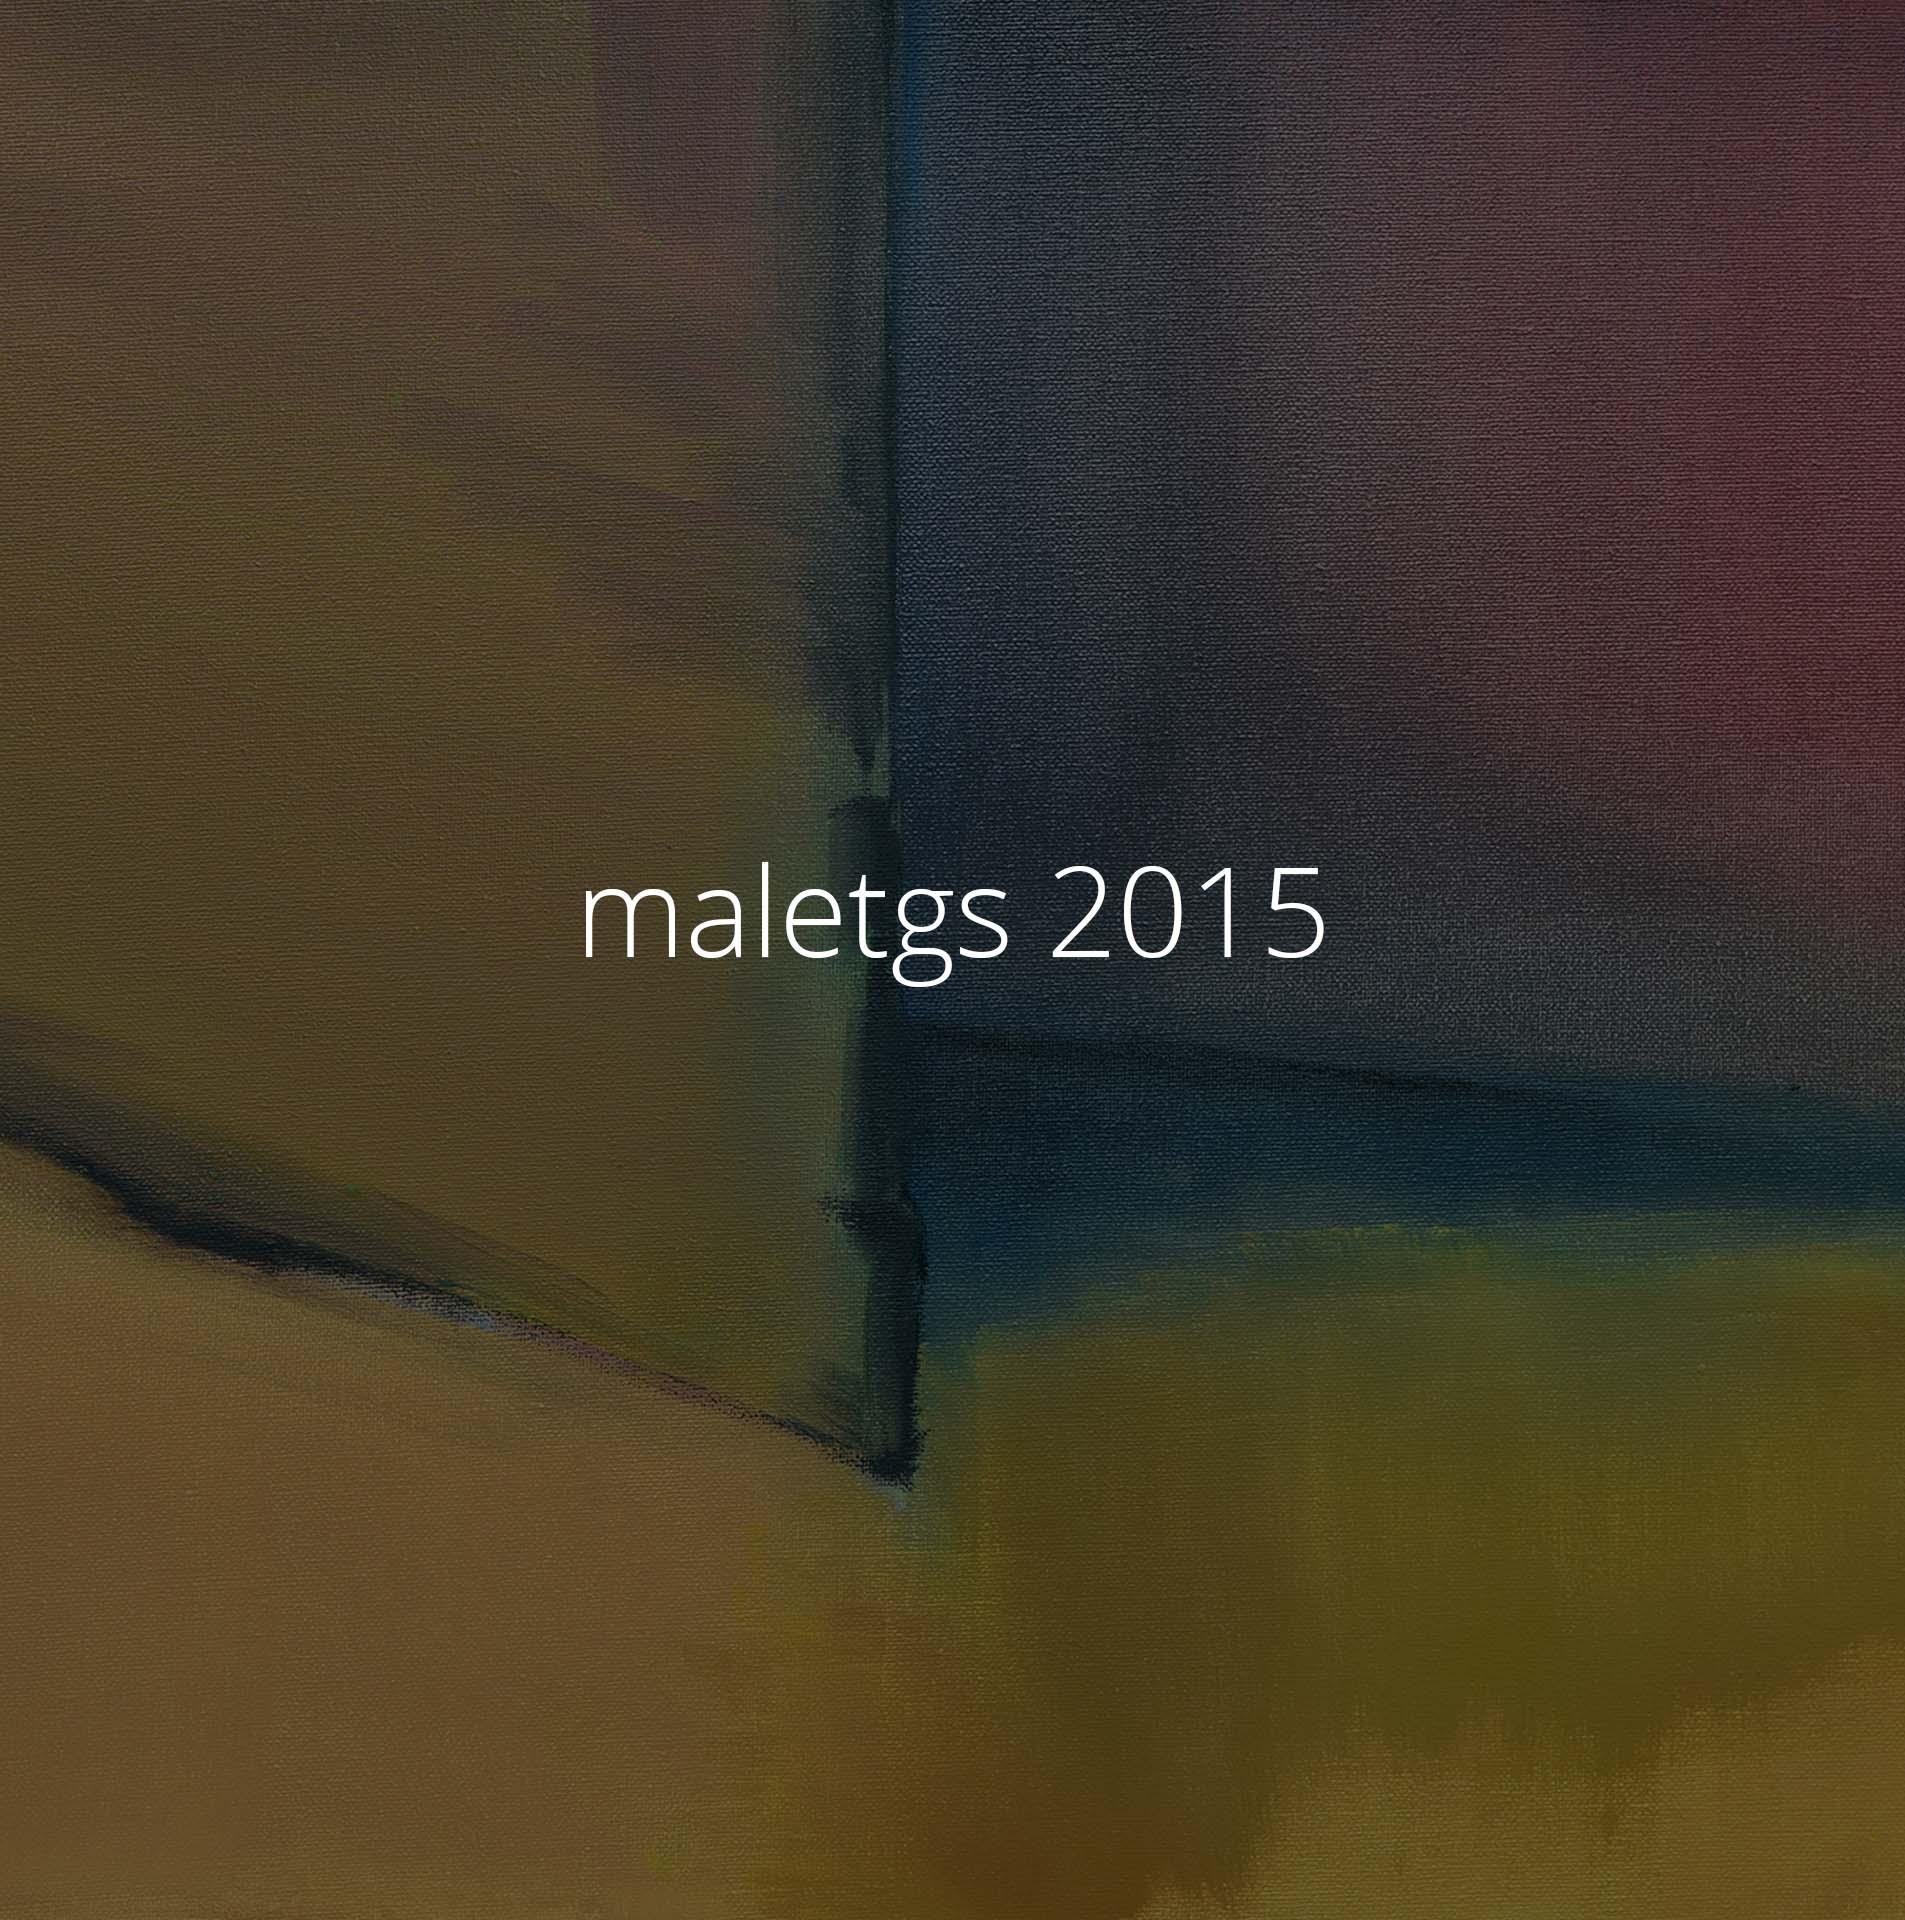 maletgs 2015